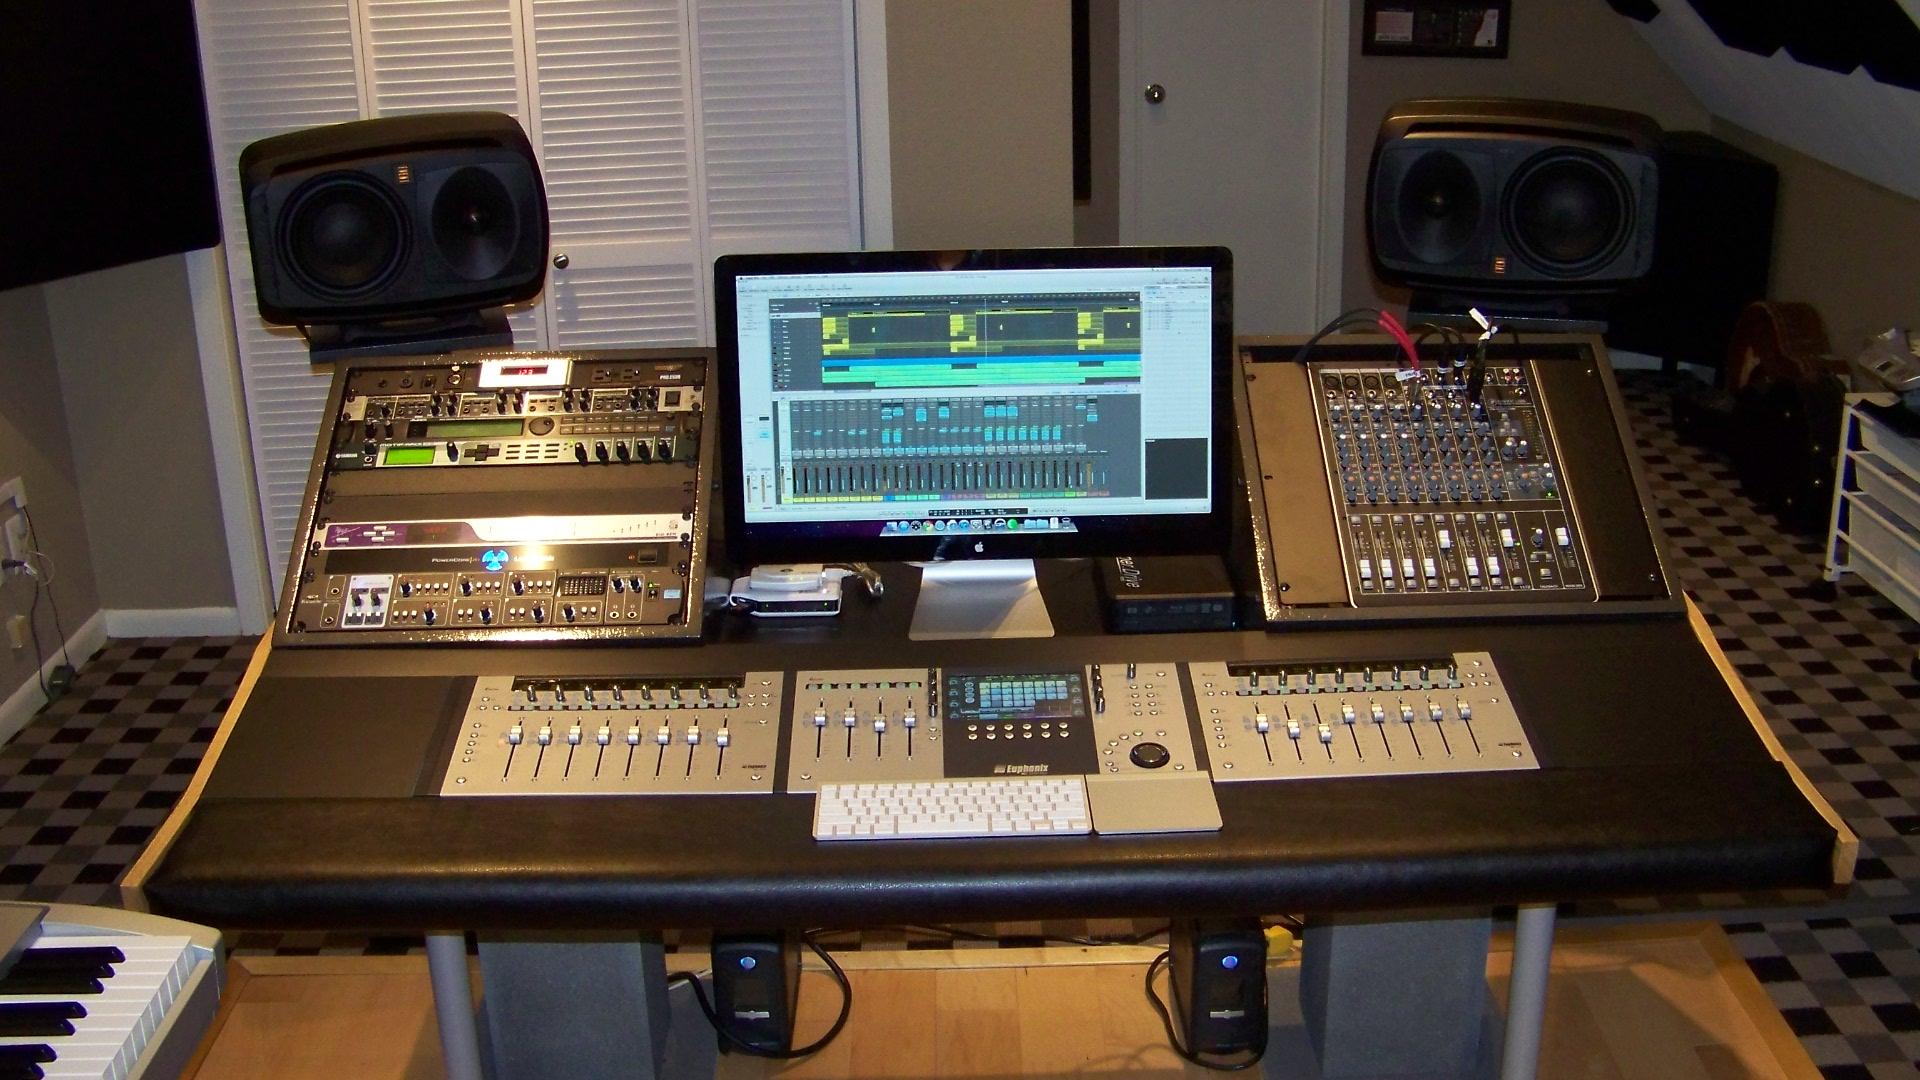 building a poor 39 s man euphonix system 5 mc w pics page 7 gearslutz pro audio community. Black Bedroom Furniture Sets. Home Design Ideas